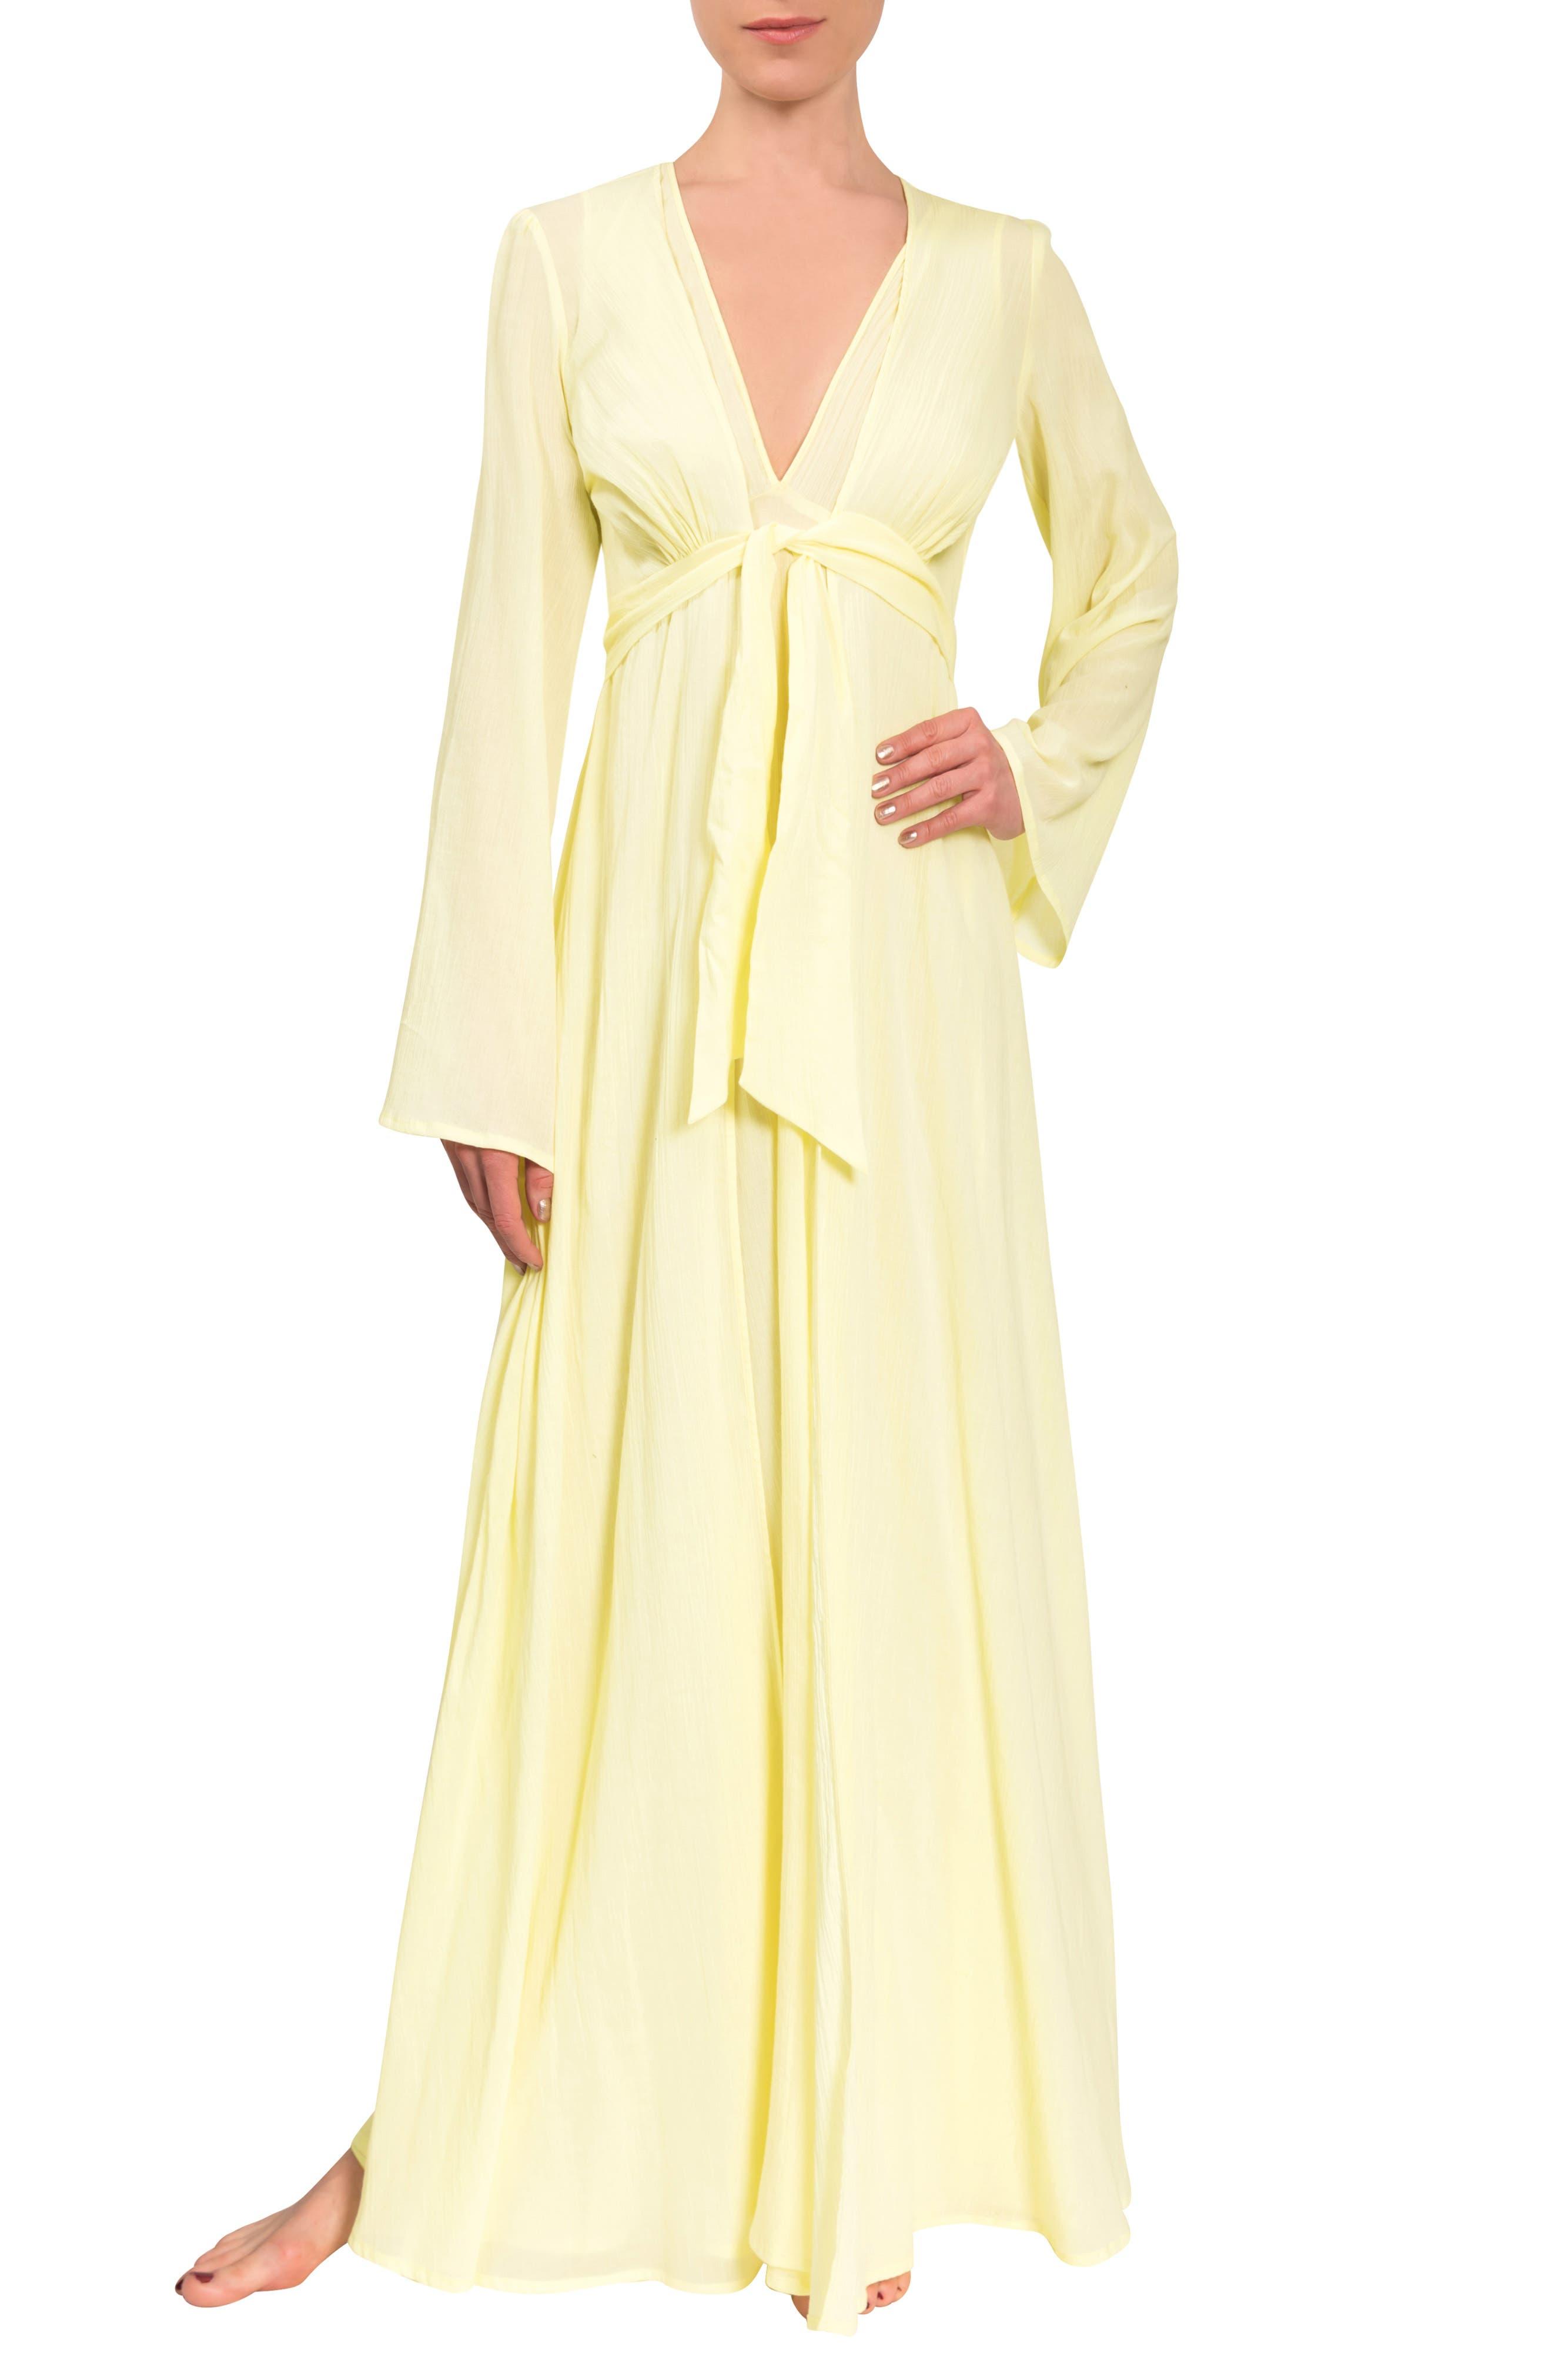 Diane Cotton Duster Robe